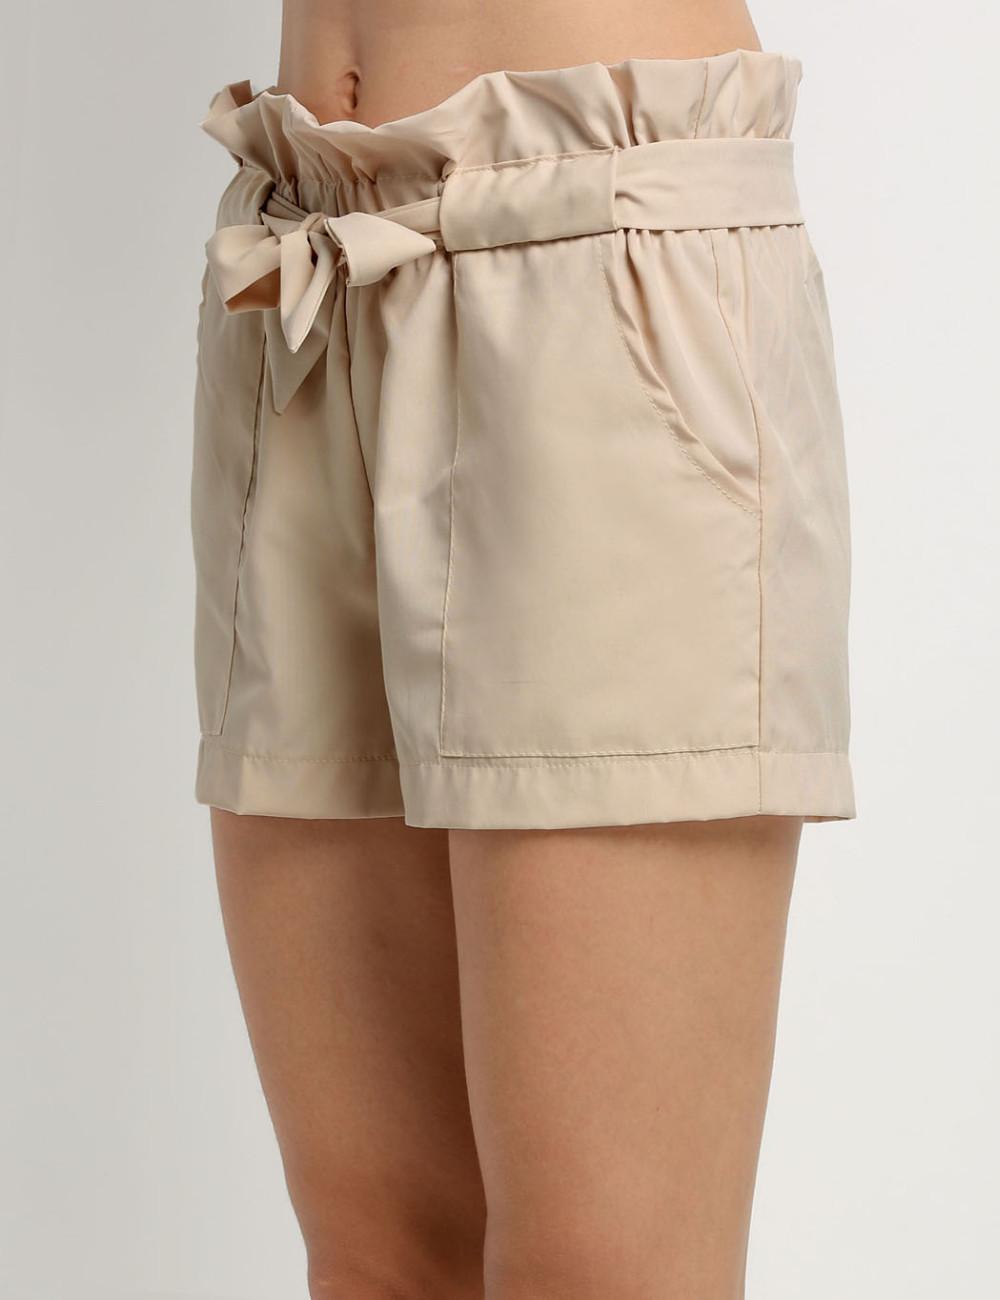 HTB1r 7hNFXXXXc.apXXq6xXFXXXj - High Waist Shorts Loose Shorts With Belt Woman PTC 59